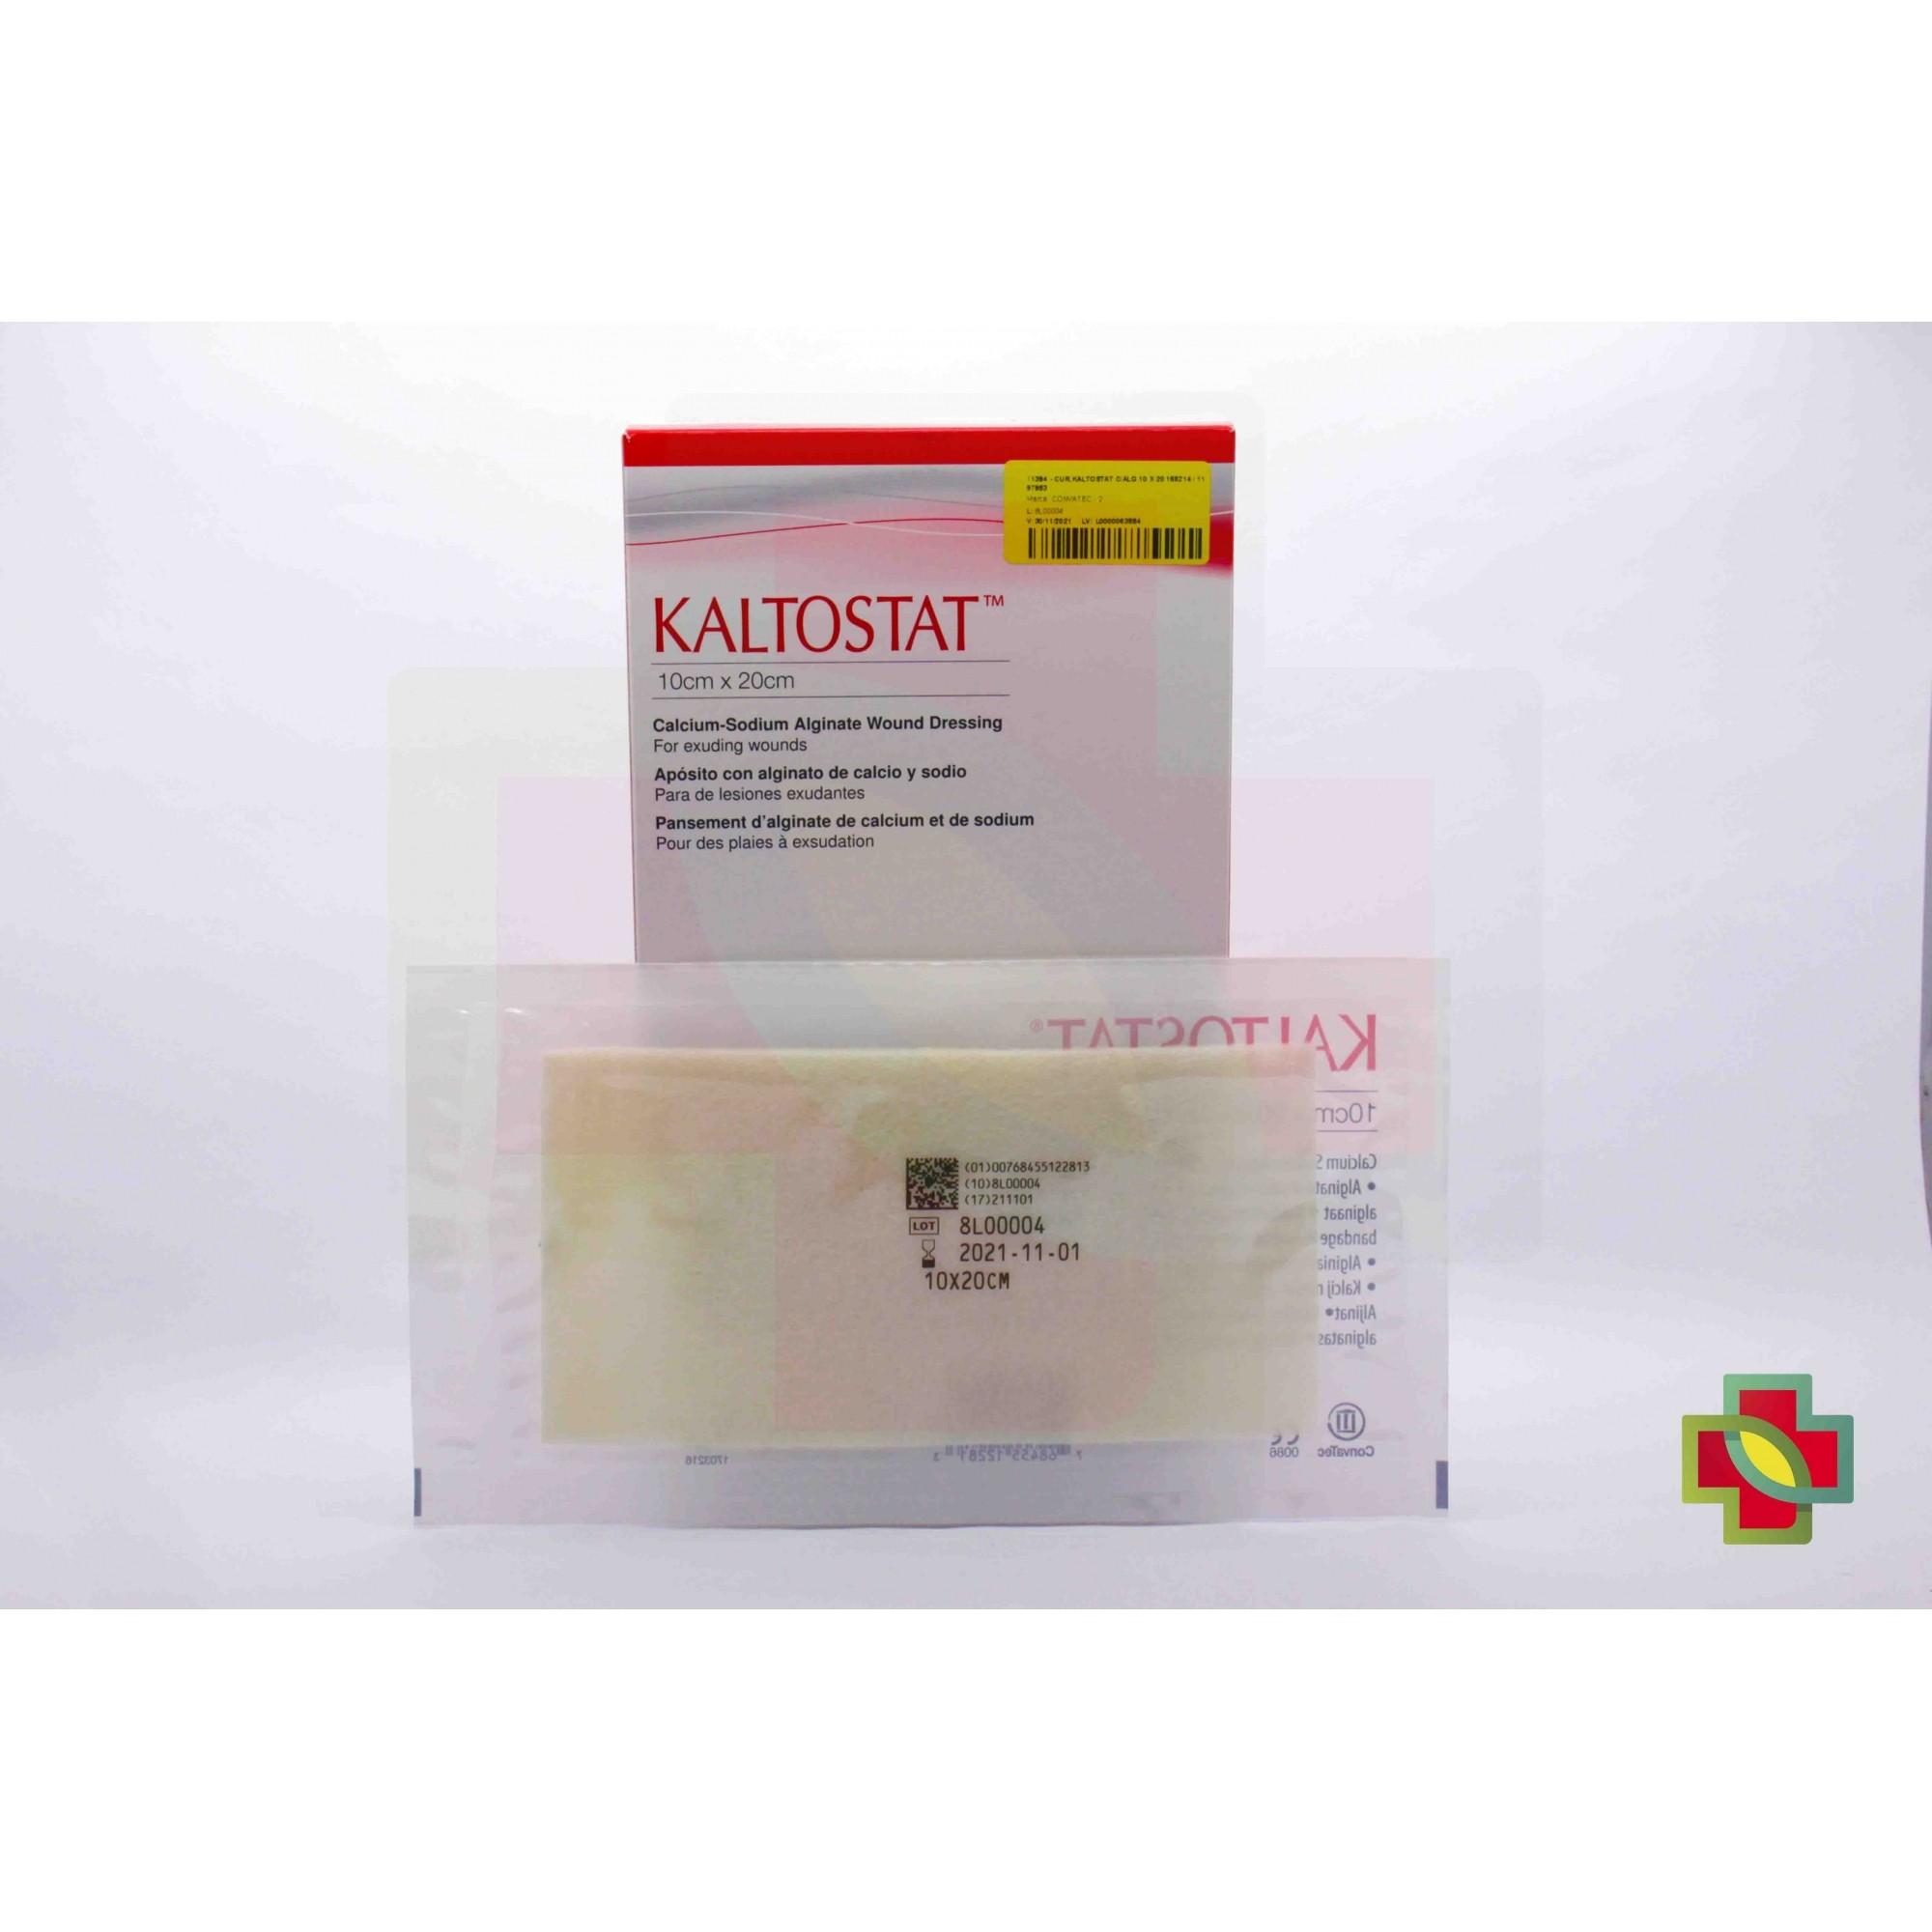 CURATIVO KALTOSTAT 10 X 20 CM (C/10 UNDS) 168214 - CONVATEC